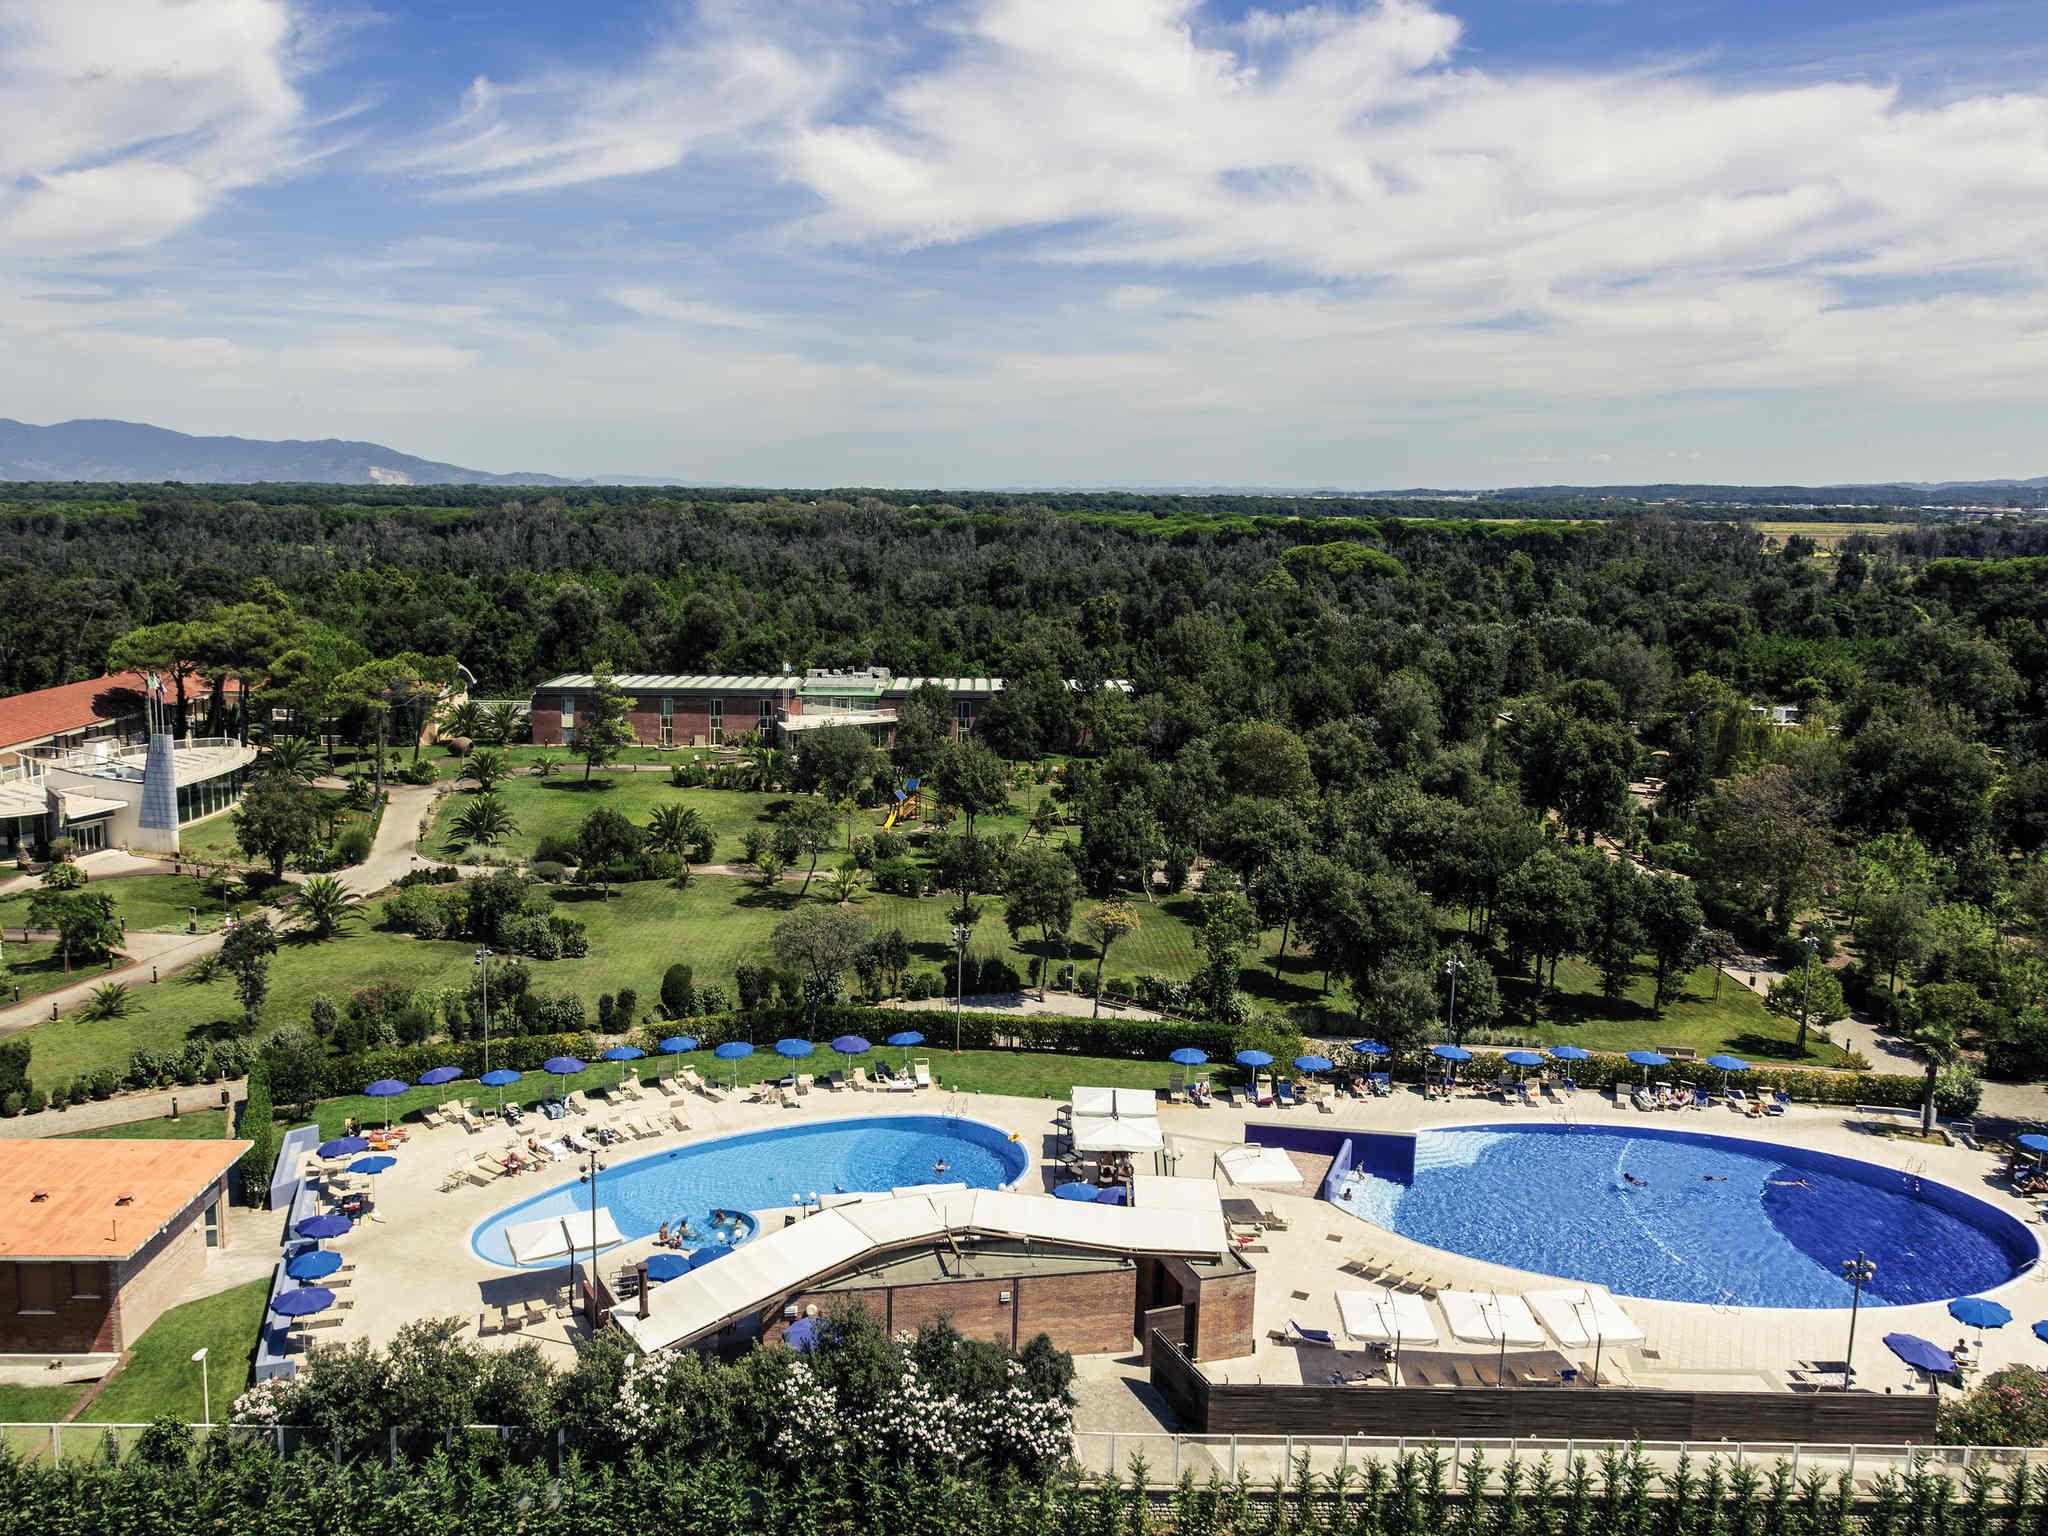 Otel – Hotel Mercure Tirrenia Green Park - New Opening